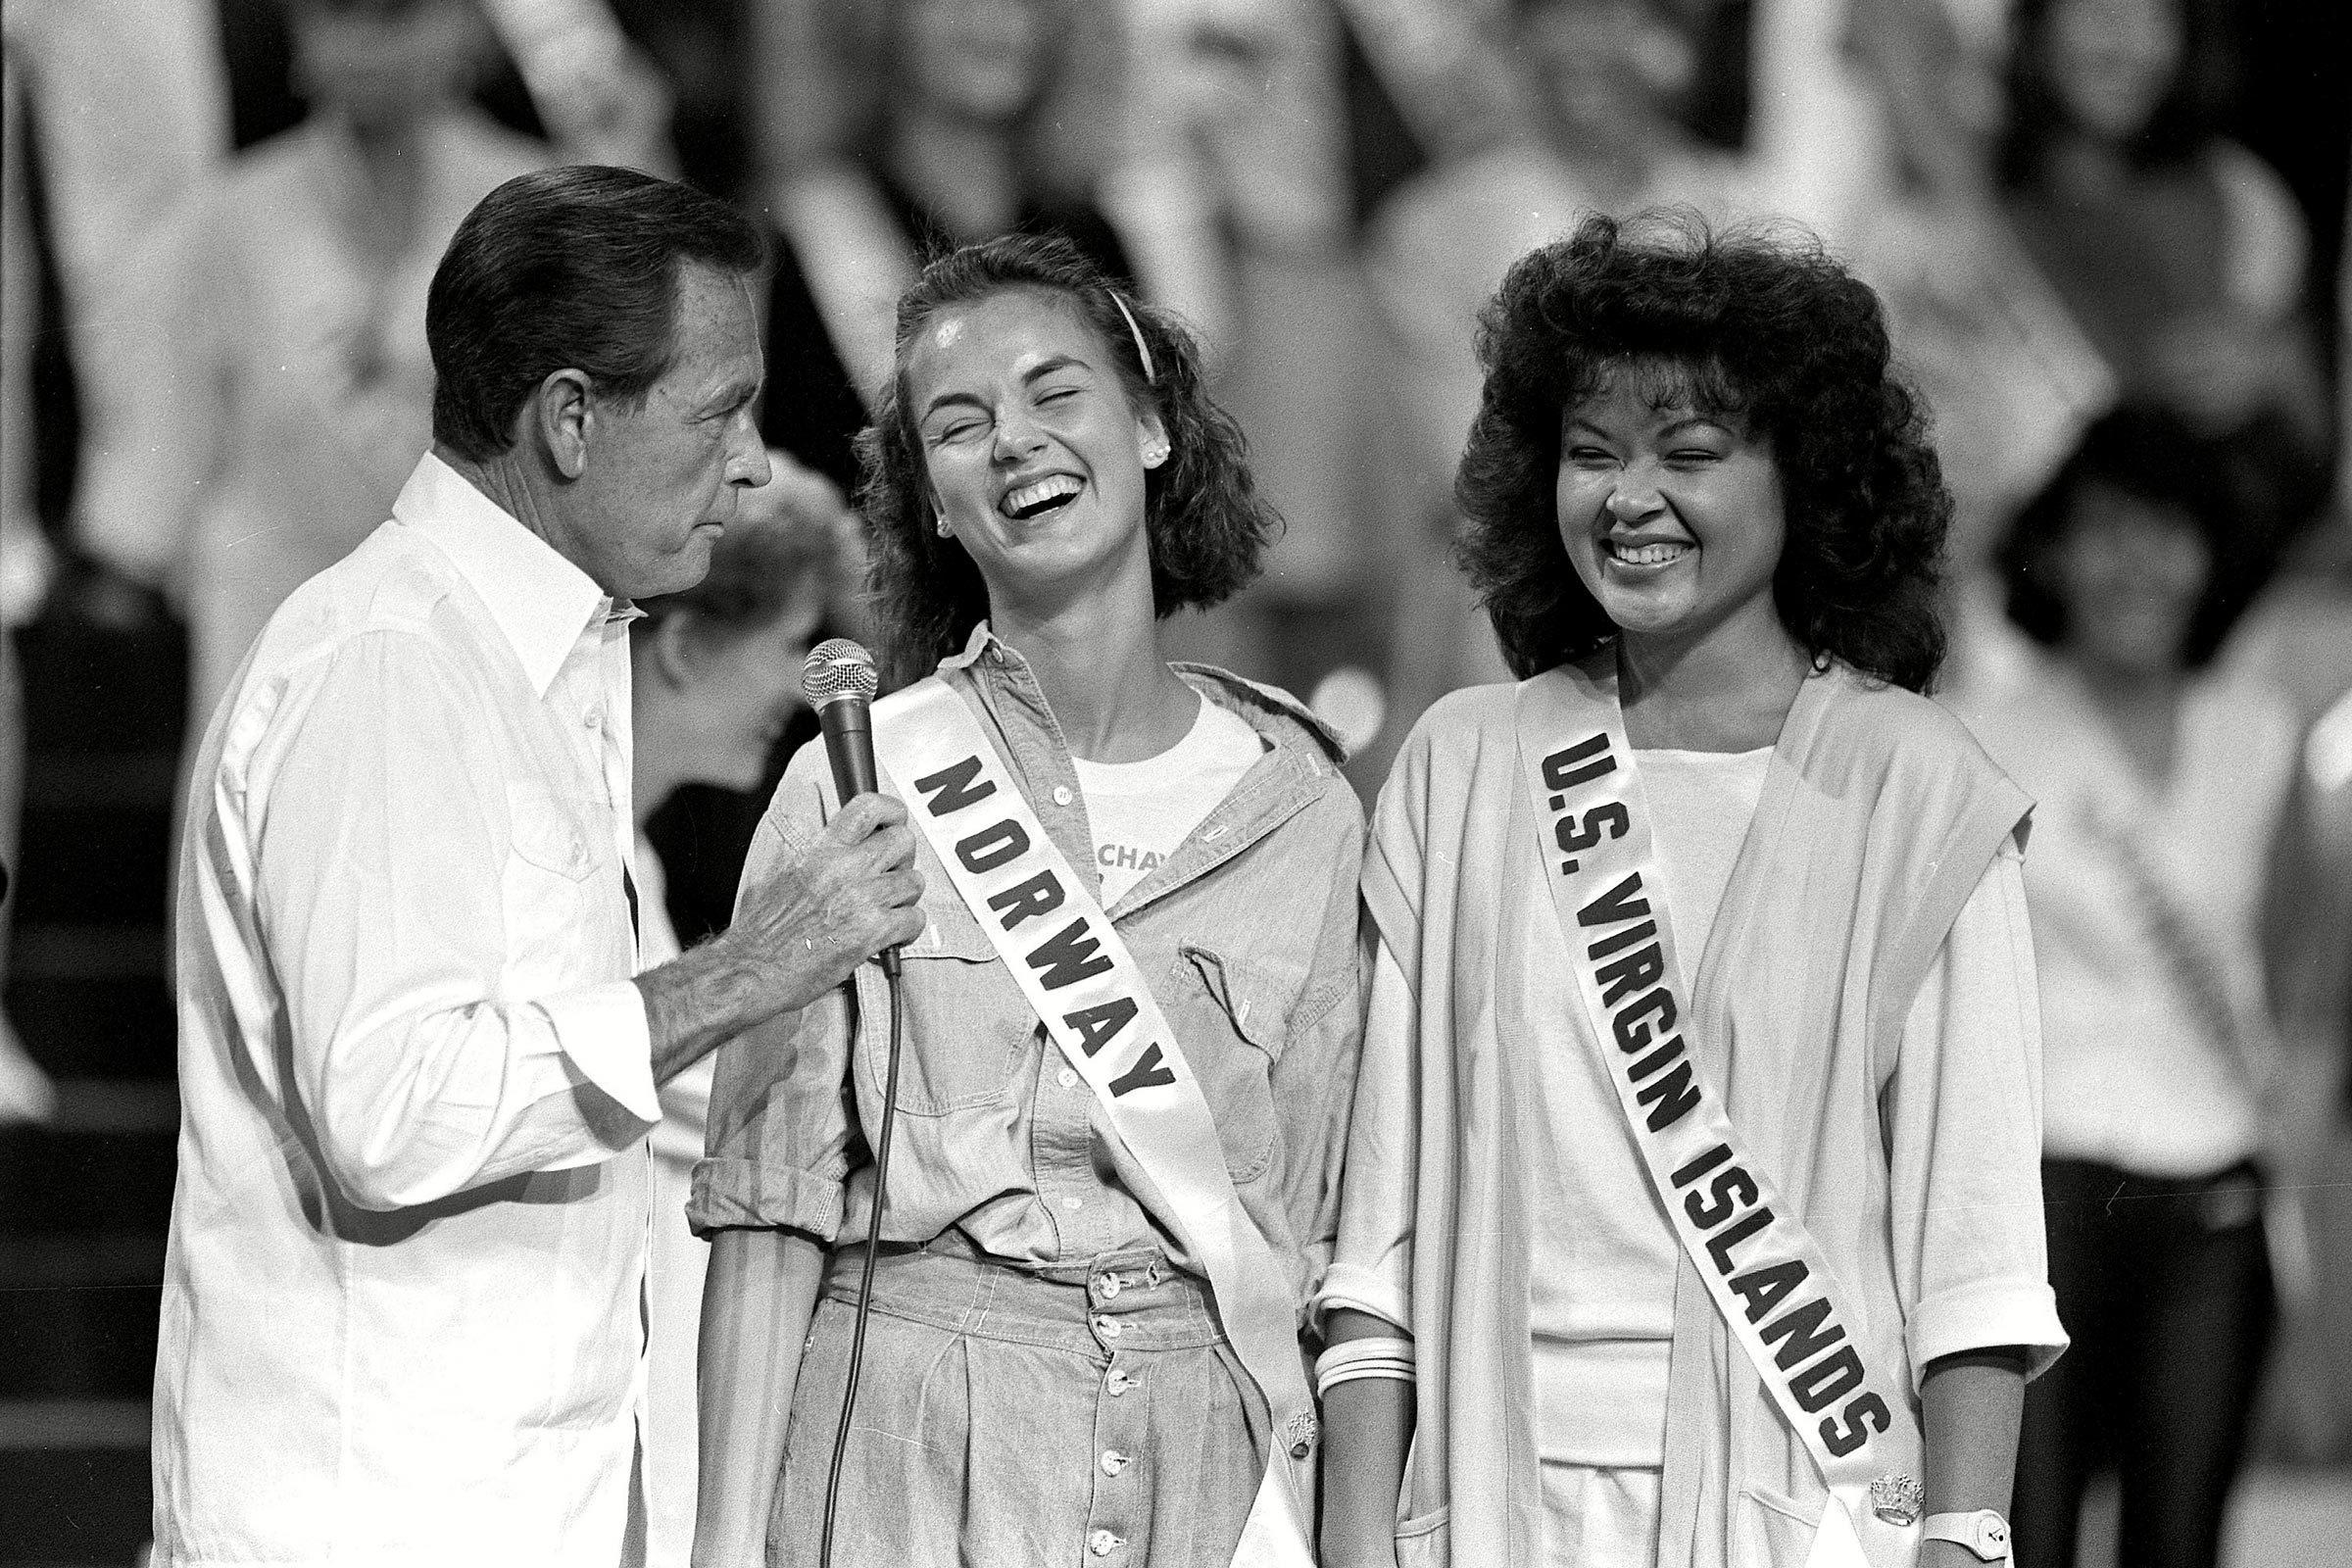 1985 host for Miss Universe pagaent, Bob Barker, tells a joke during rehersals.